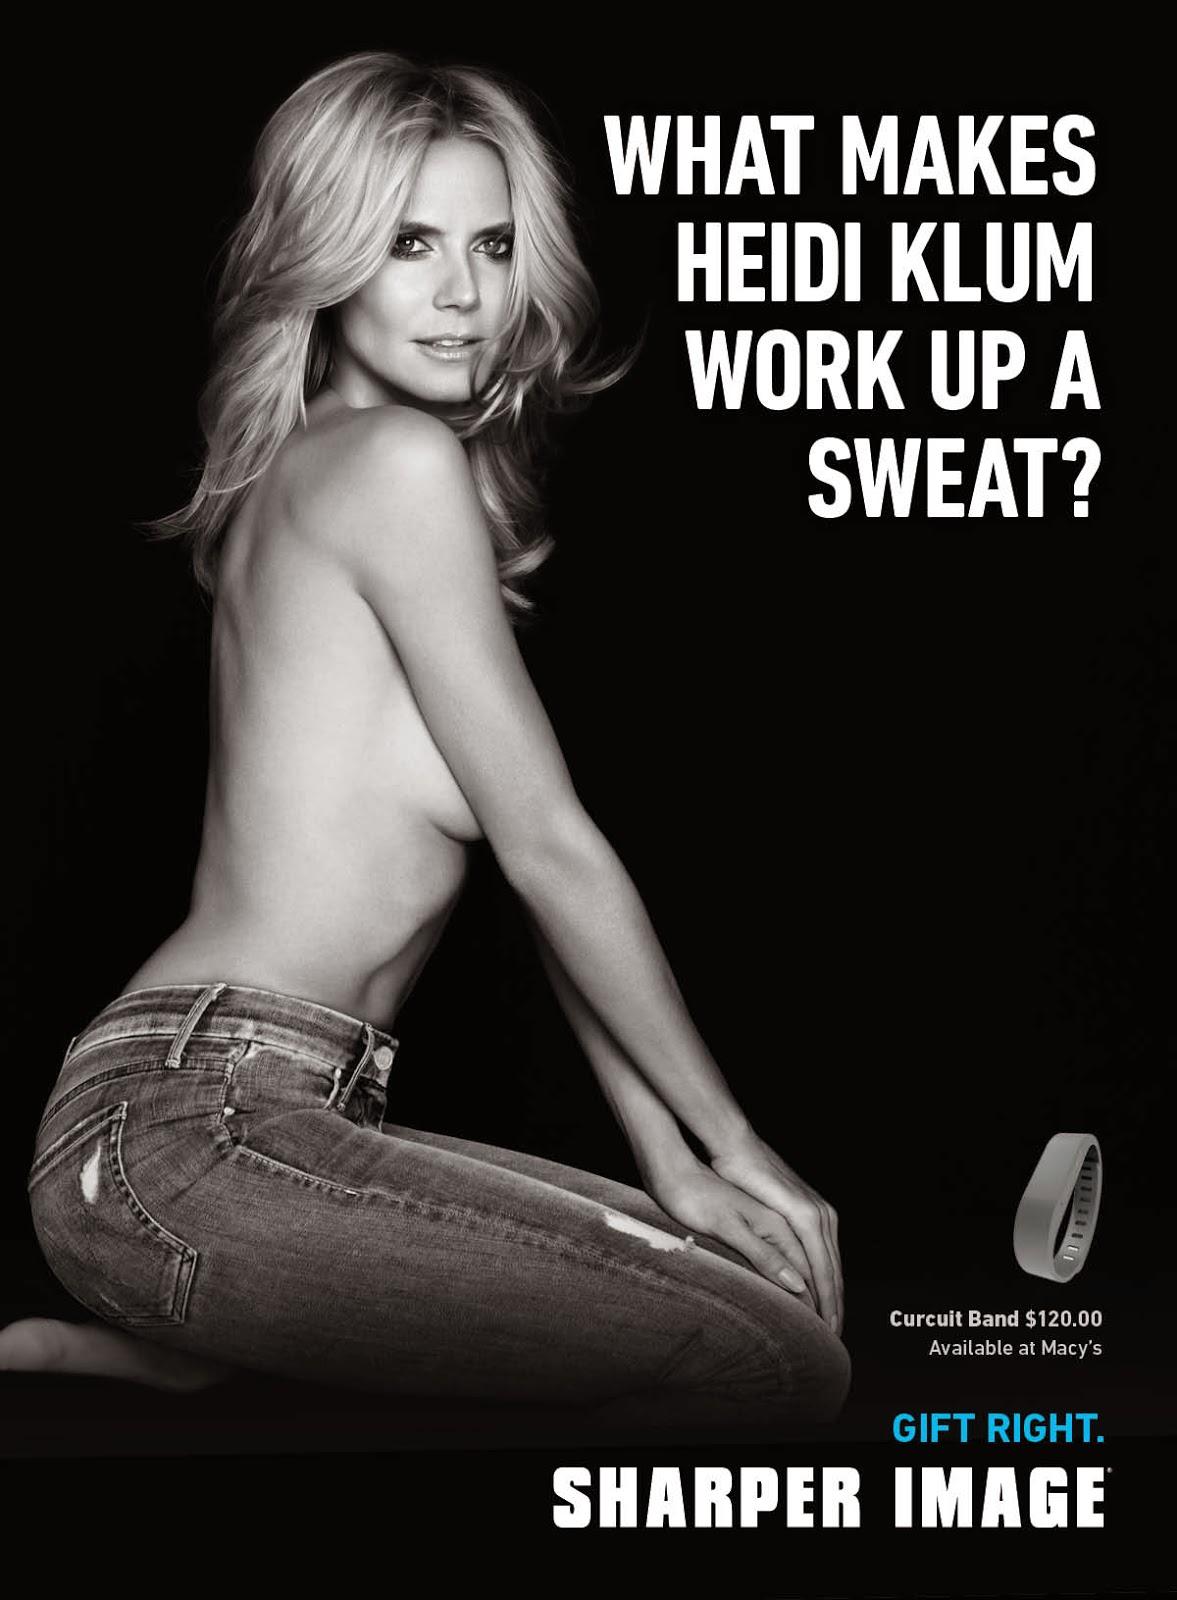 Pin on Heidi Klums album